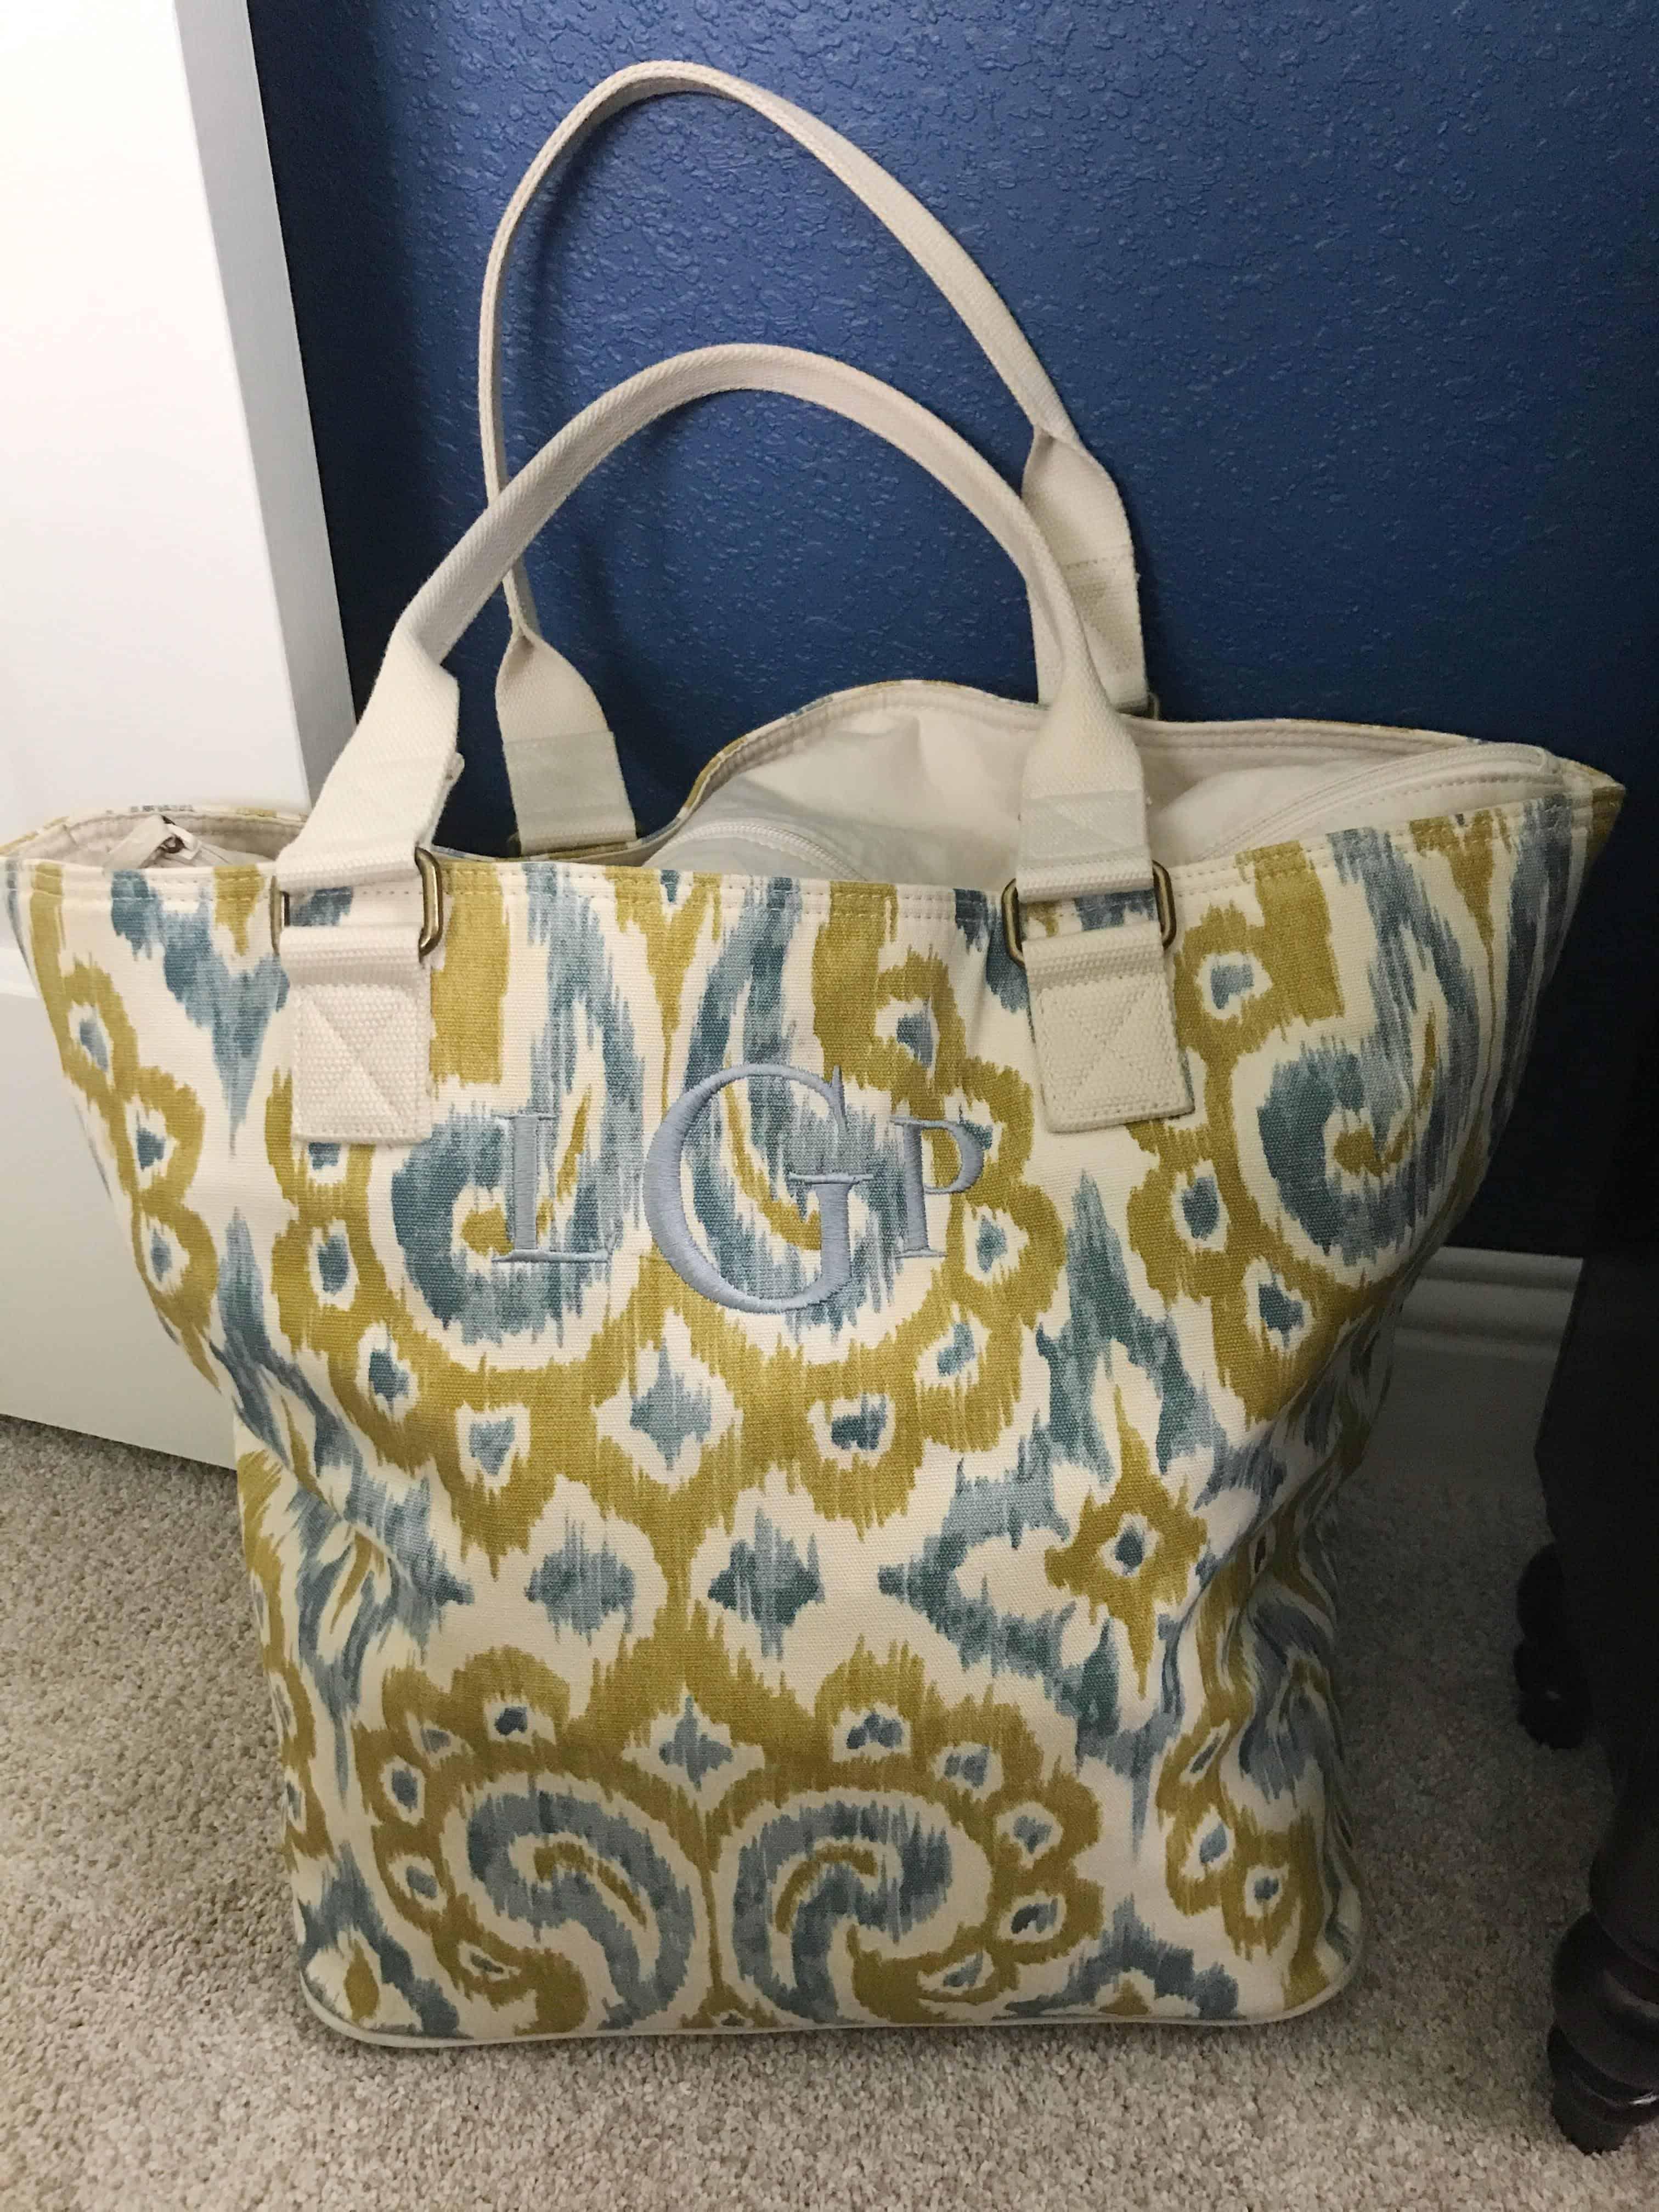 bag for hospital c section